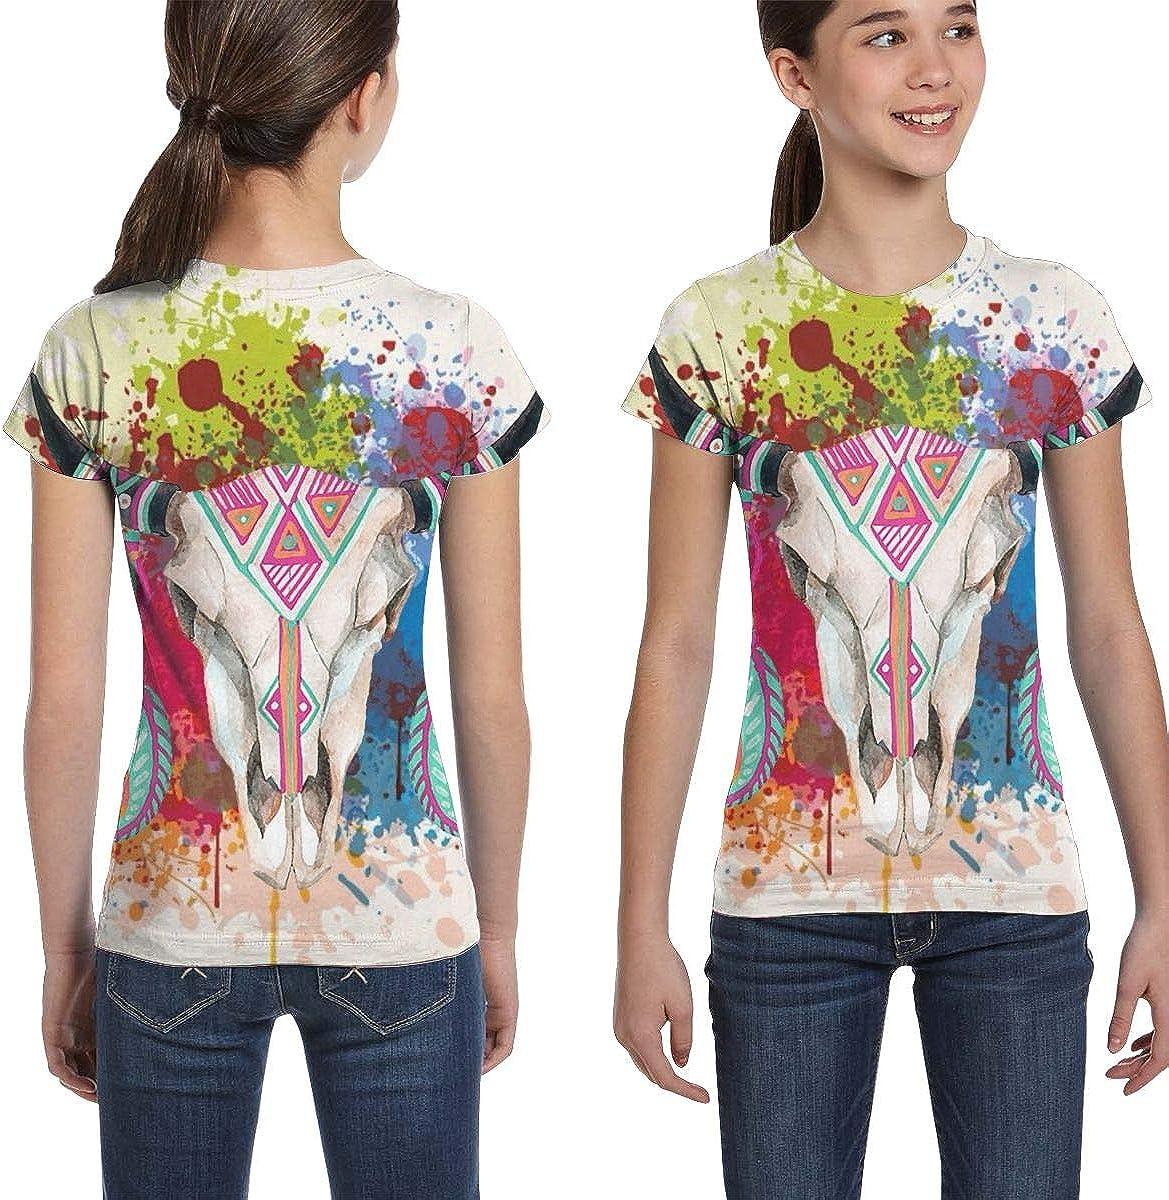 L6Nv4o@A Girls Short Sleeve Sheepshead T-Shirts XS-XL Casual Blouse Clothes